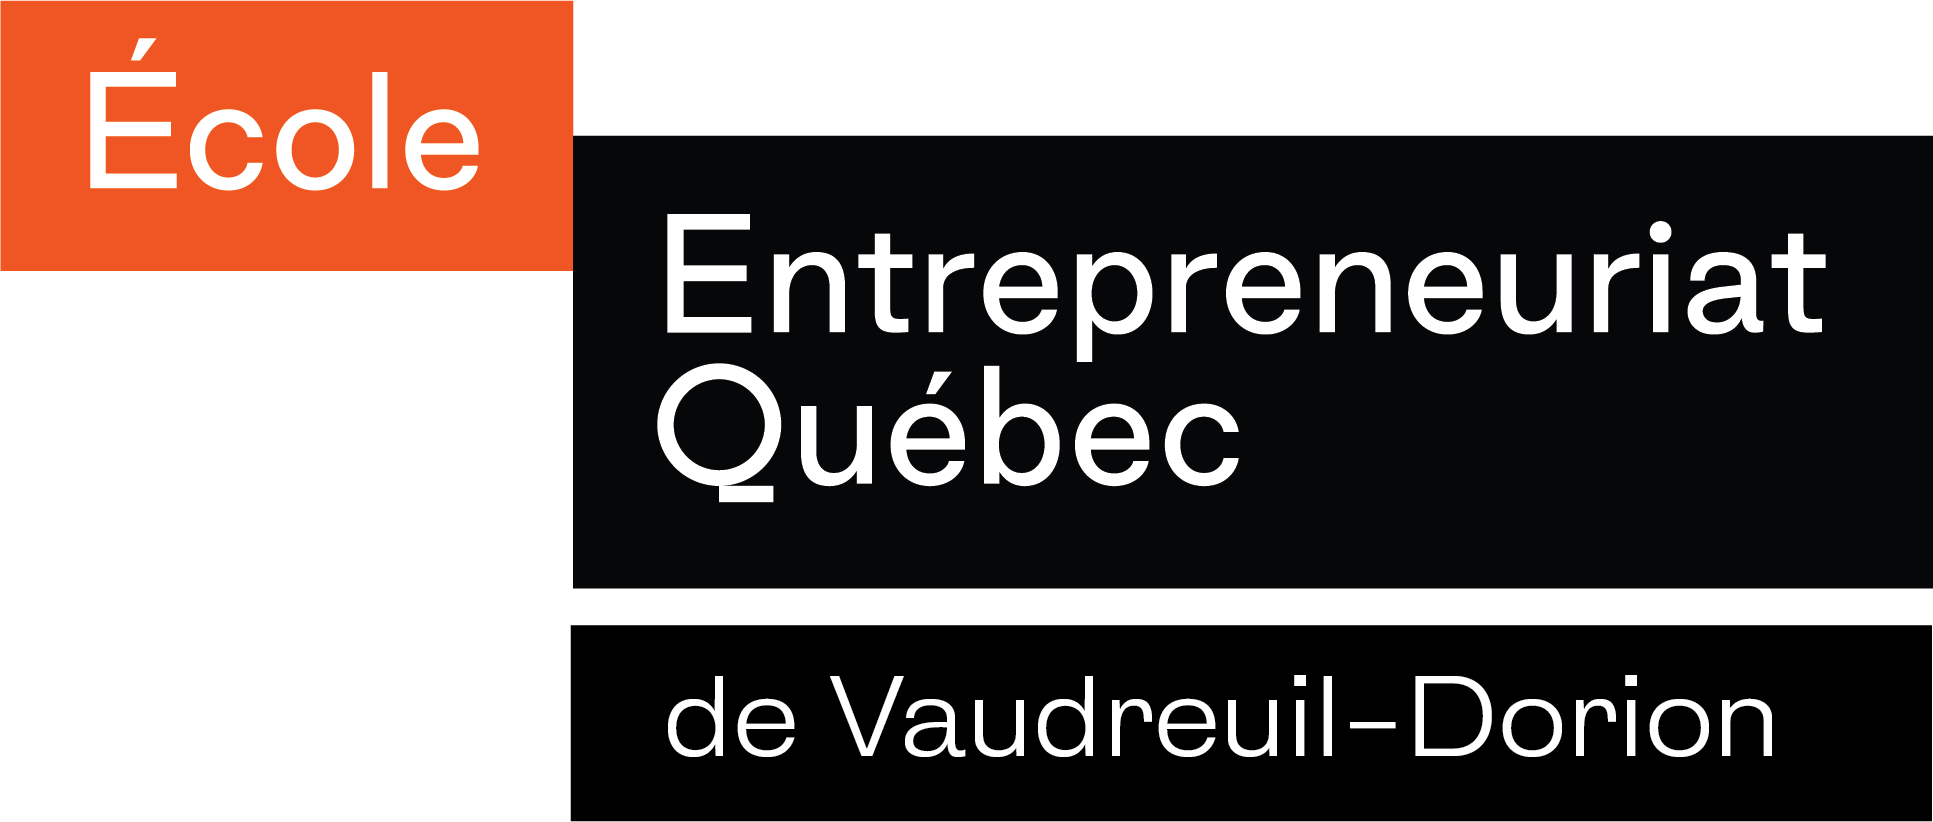 Logos ÉEQ de Vaudreuil-Dorion